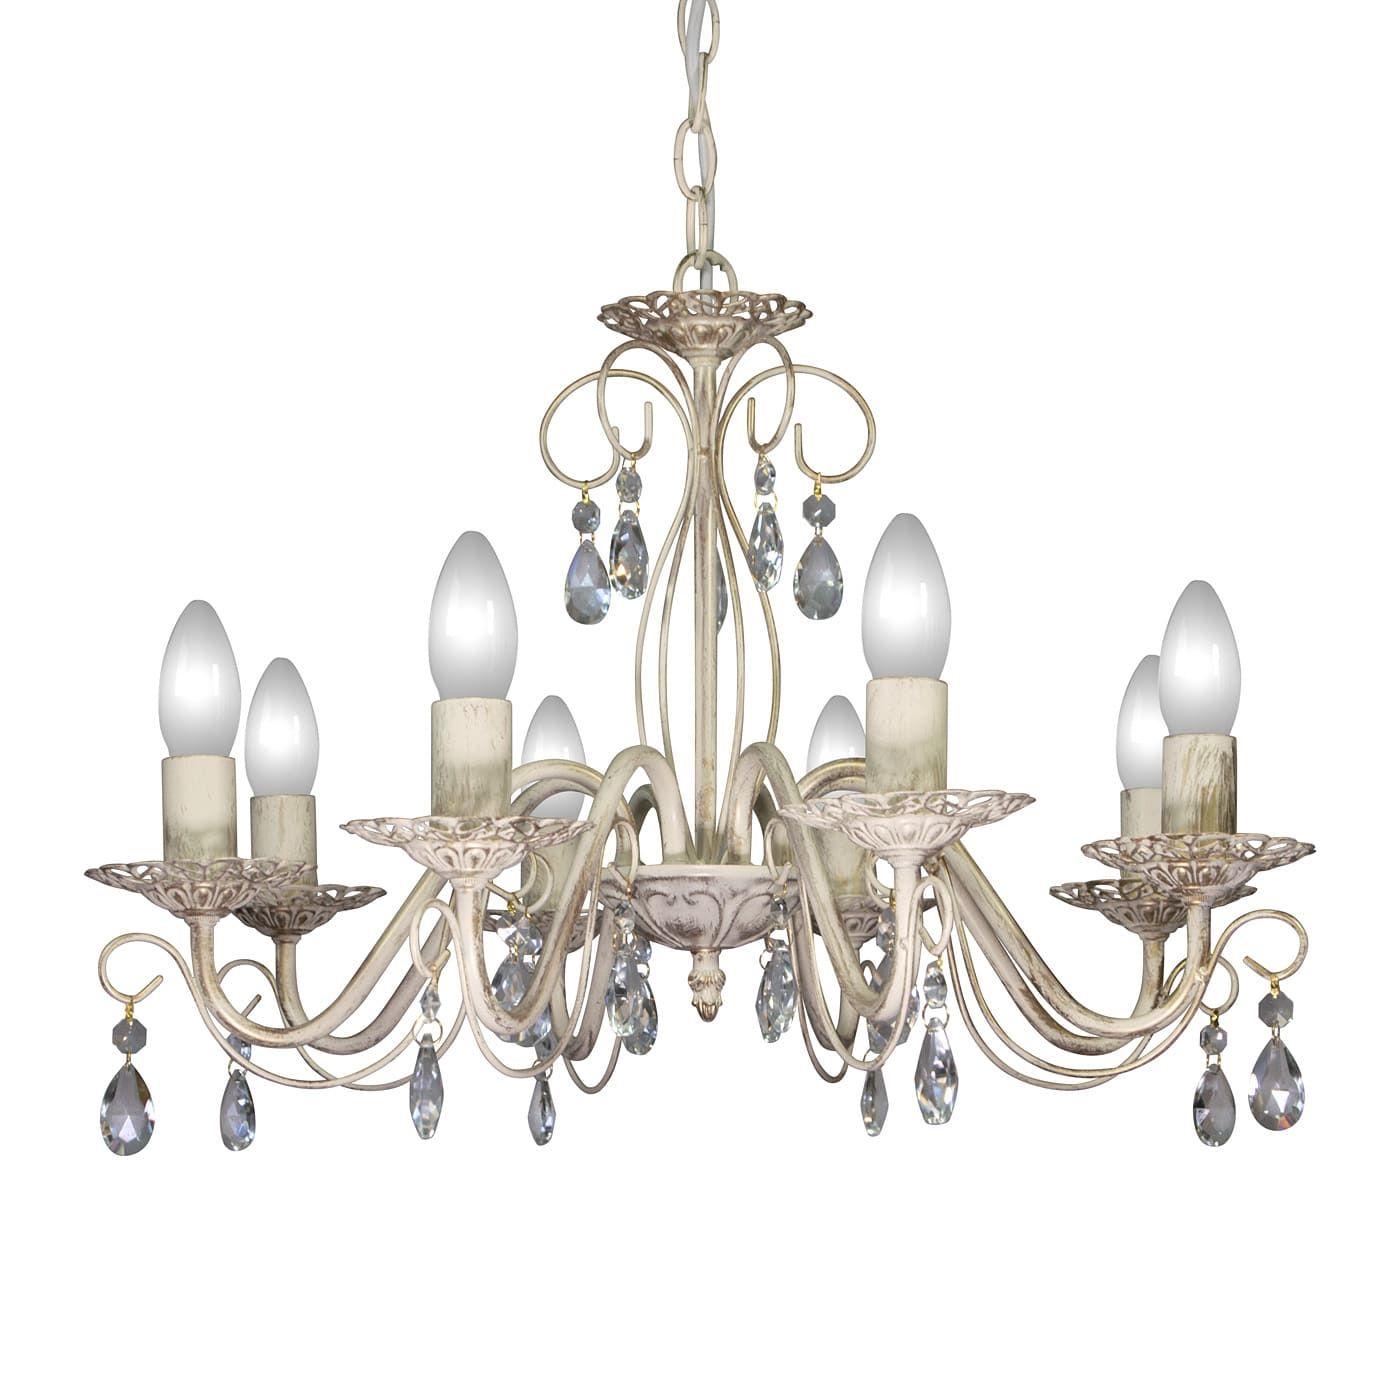 PETRASVET / Pendant chandelier S8068-8, 8xE14 max. 60W